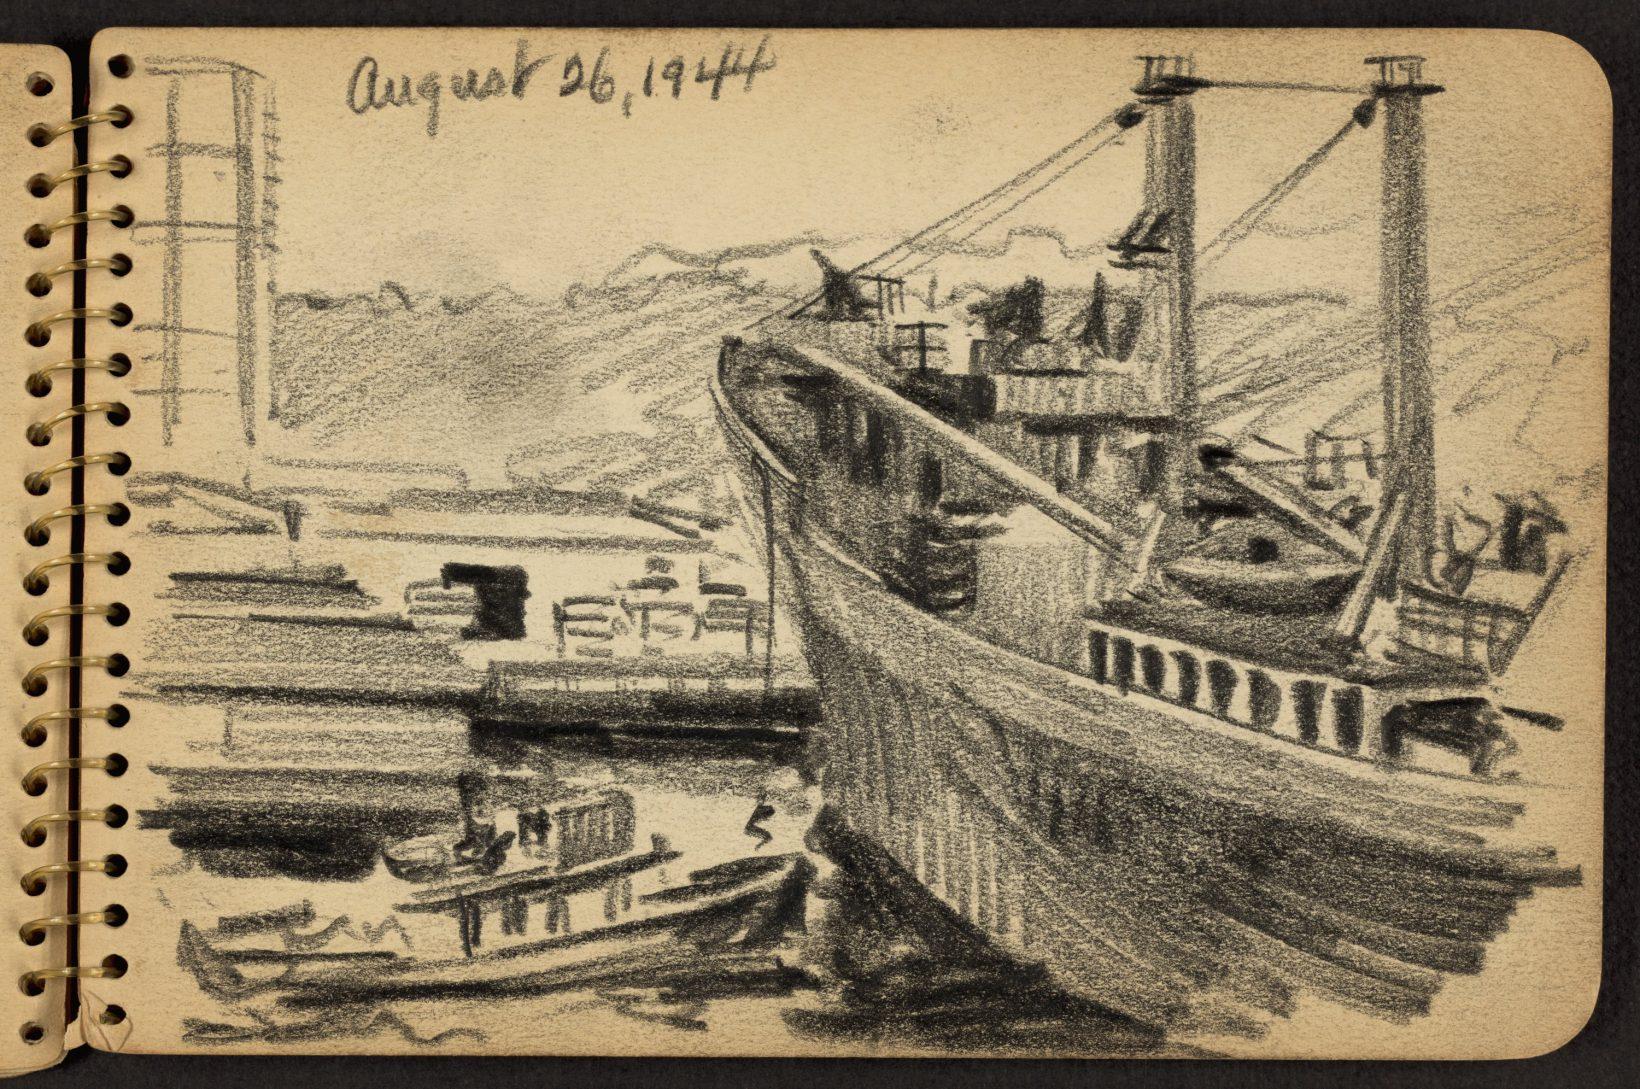 victor-lundy-carnet-croquis-seconde-guerre-mondiale-28